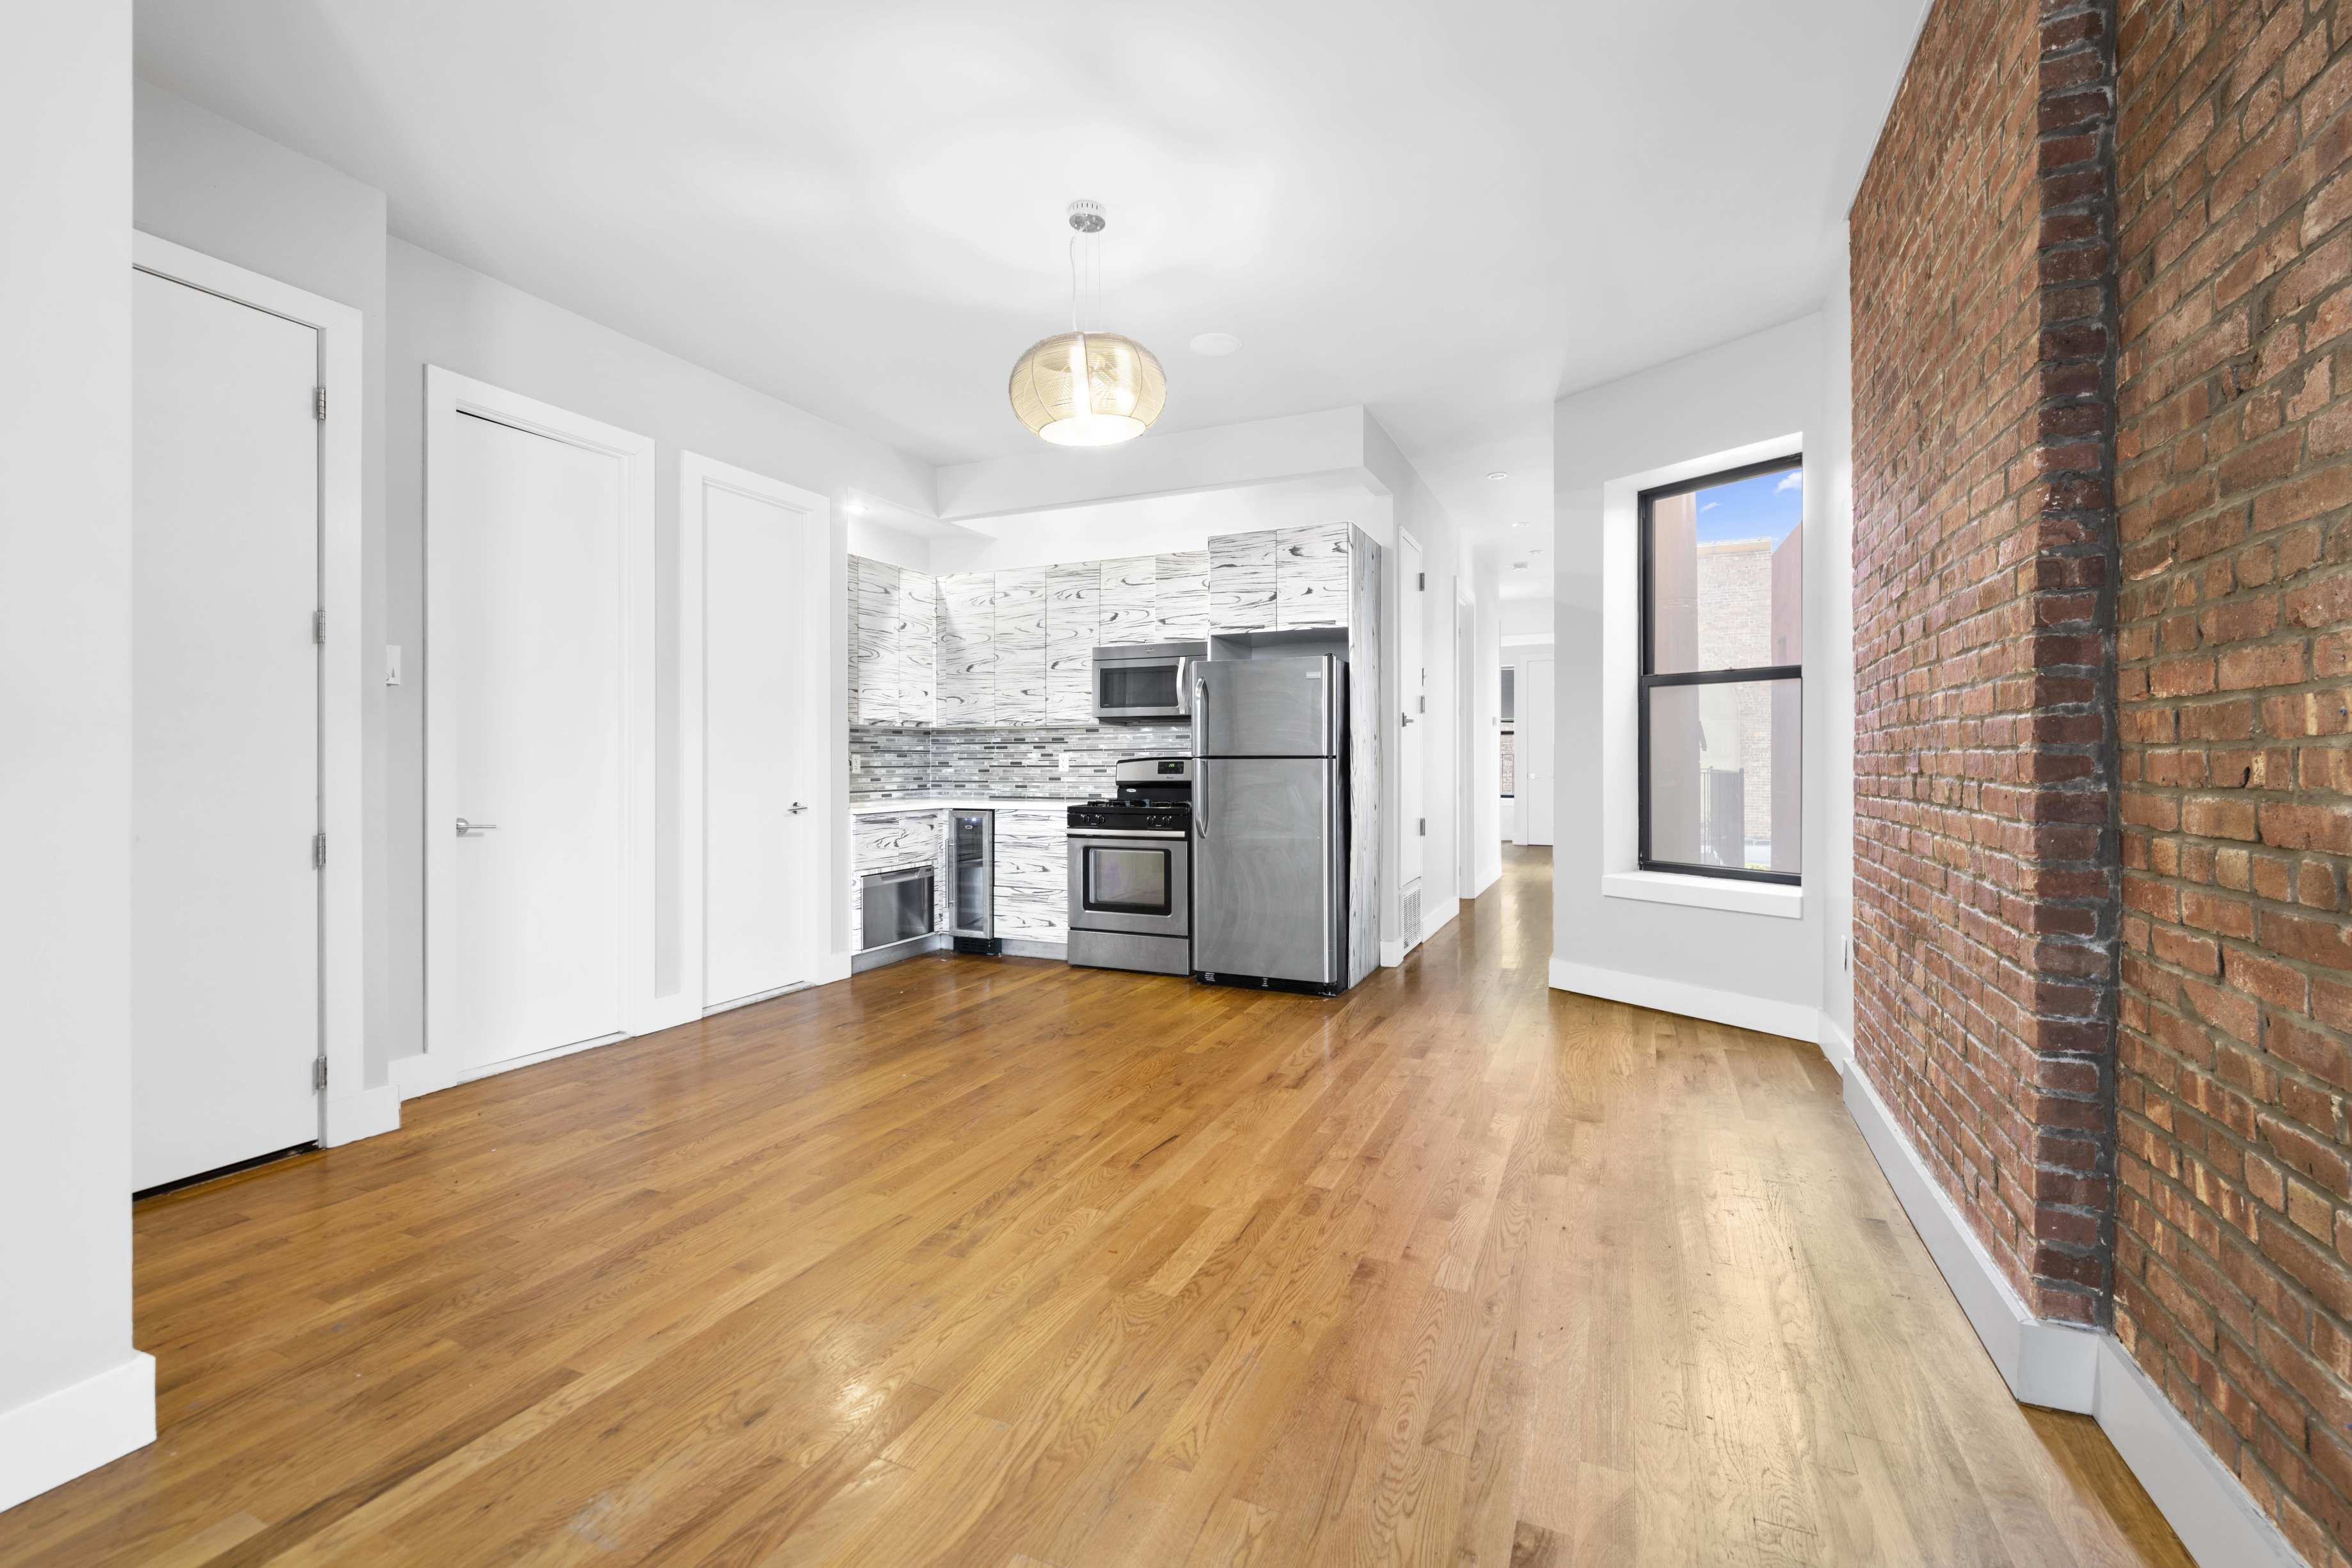 2248 Adam Clayton Powell Blvd. West Harlem New York NY 10027